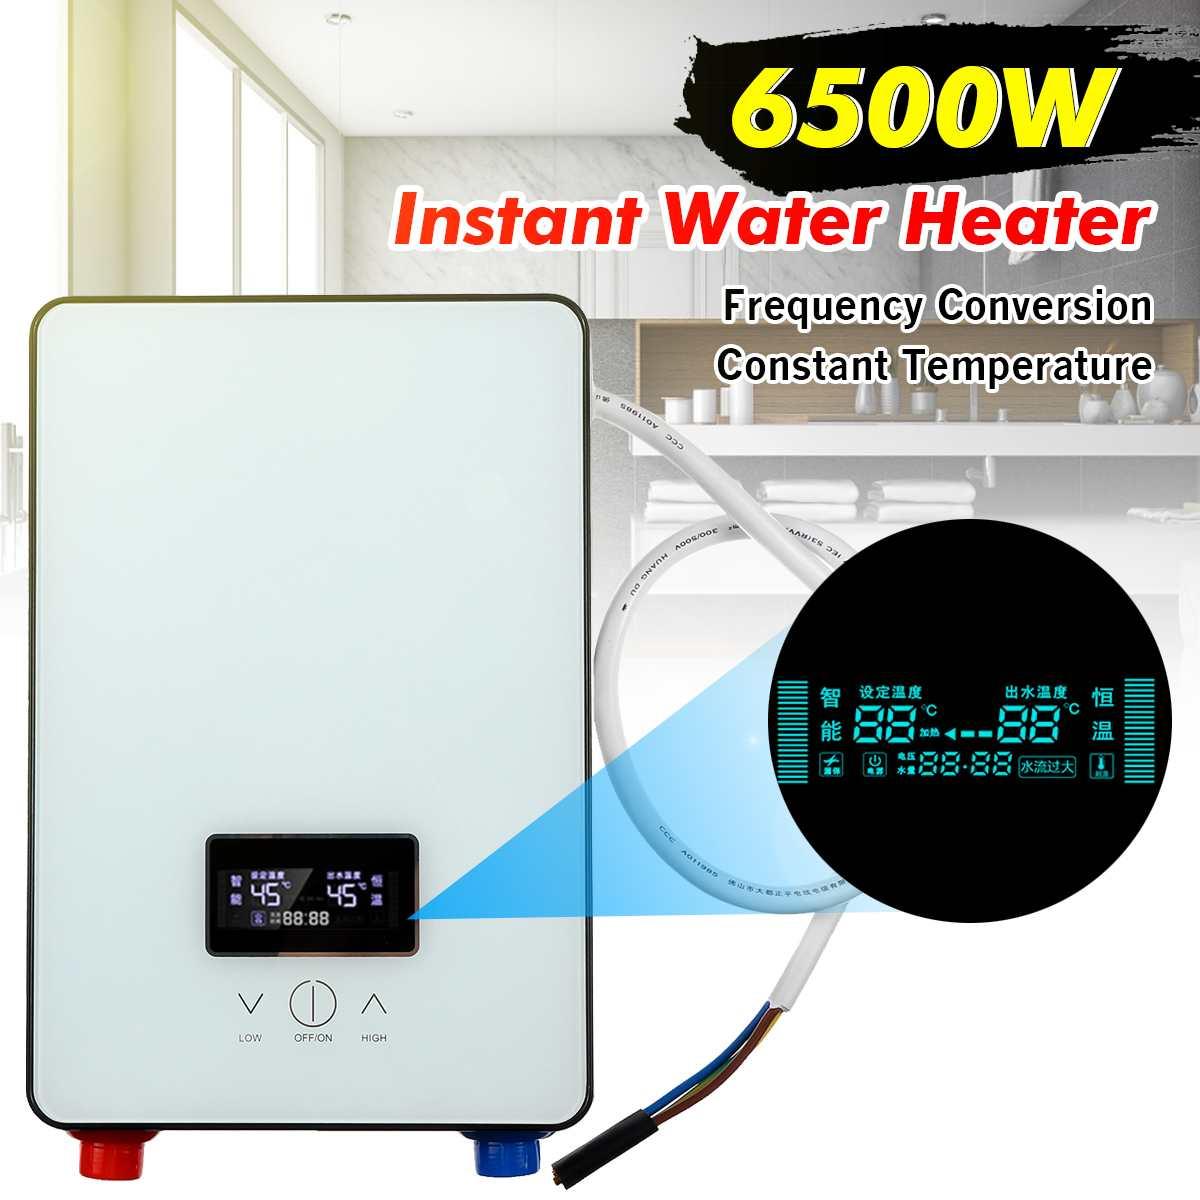 Calentador de agua instantáneo 6500W AC220V, calentador de agua eléctrico sin tanque para baño, pantalla LCD Digital inteligente de autocomprobación blanca